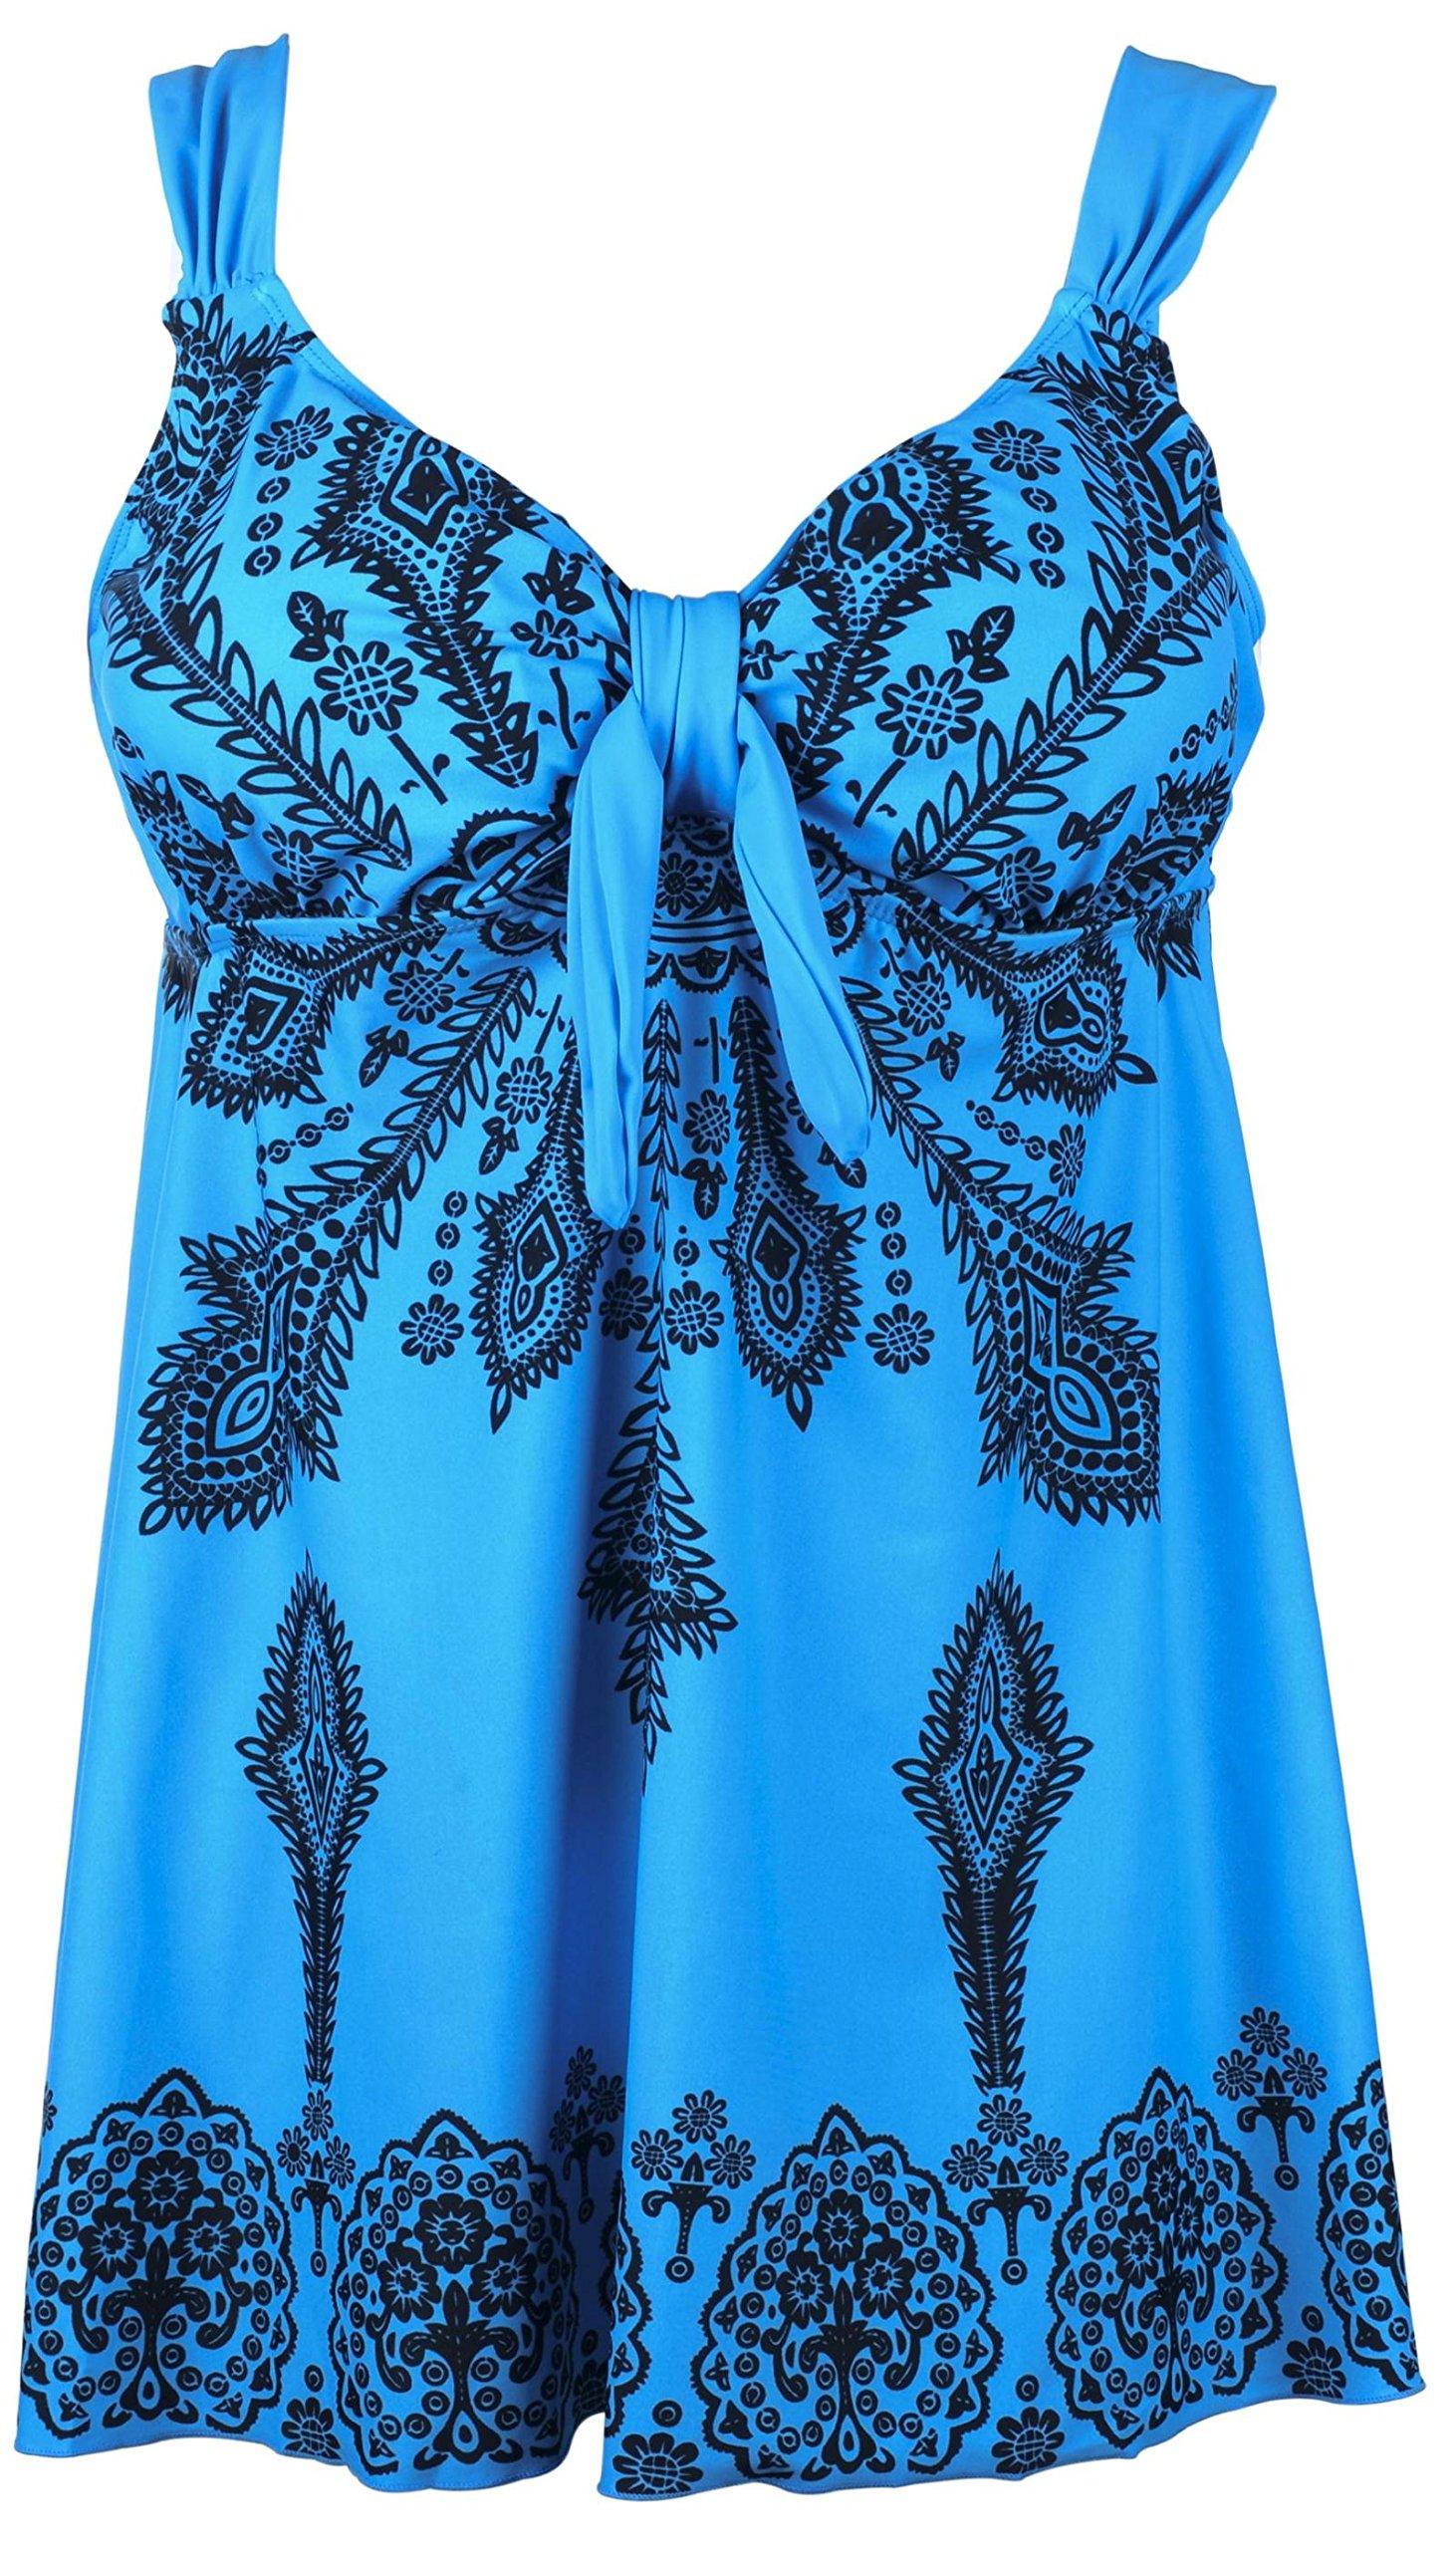 QZUnique Women's Plus-Size Swimsuit Retro Print Two Piece Pin up Tankini Swimwear SkyBlue US 20W